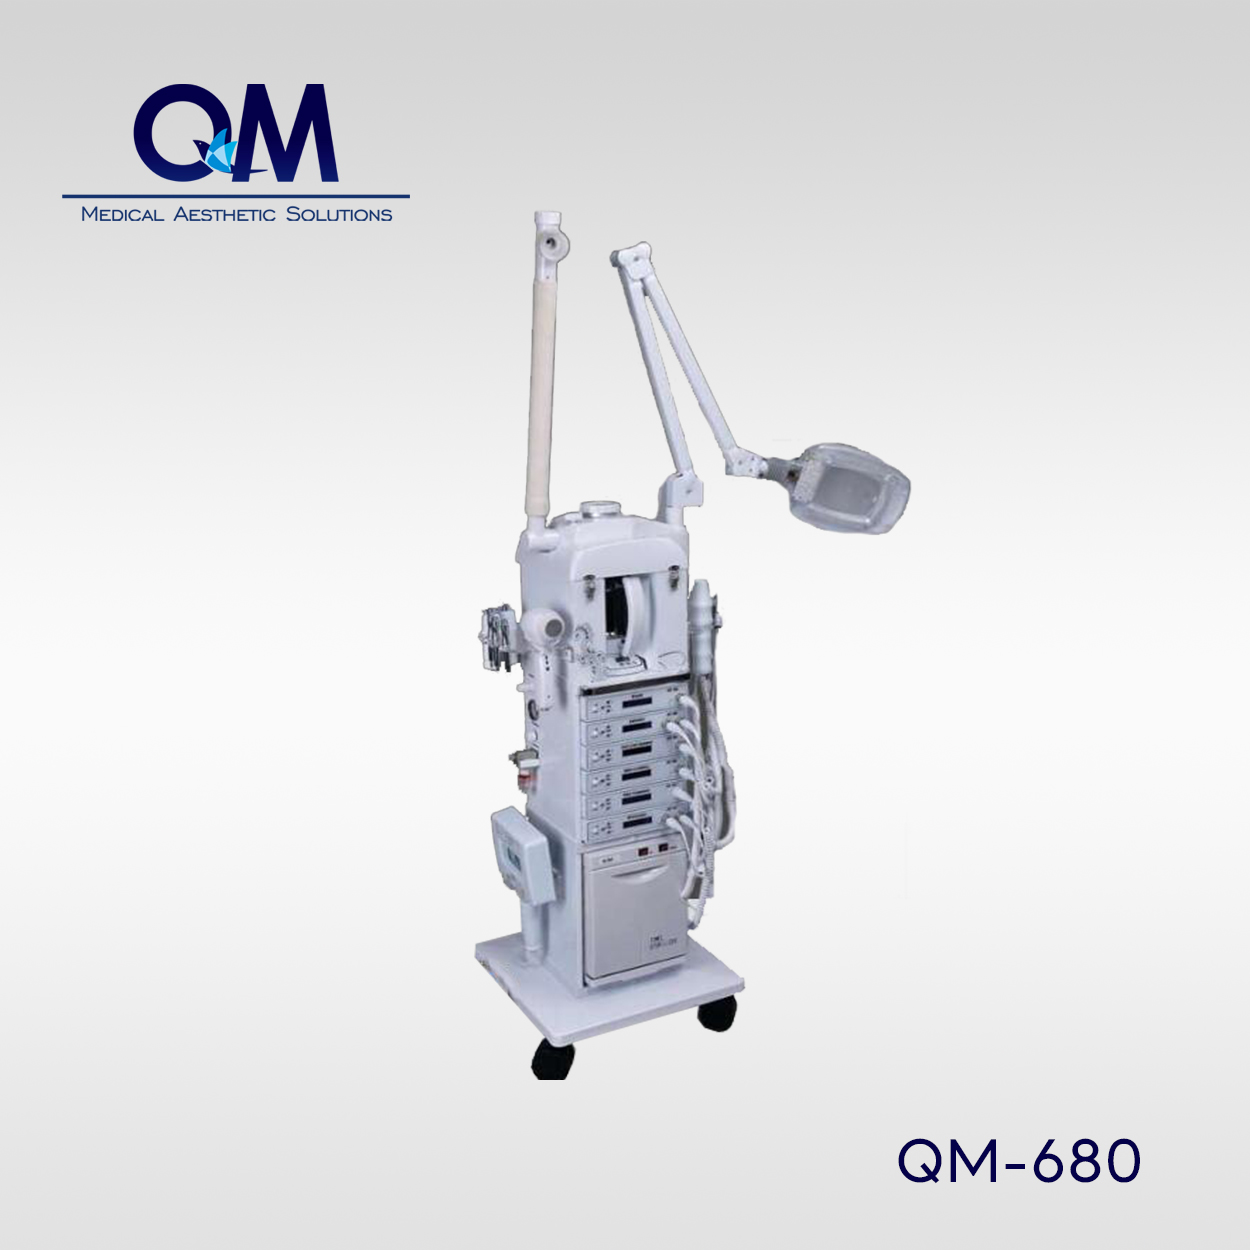 QM-680